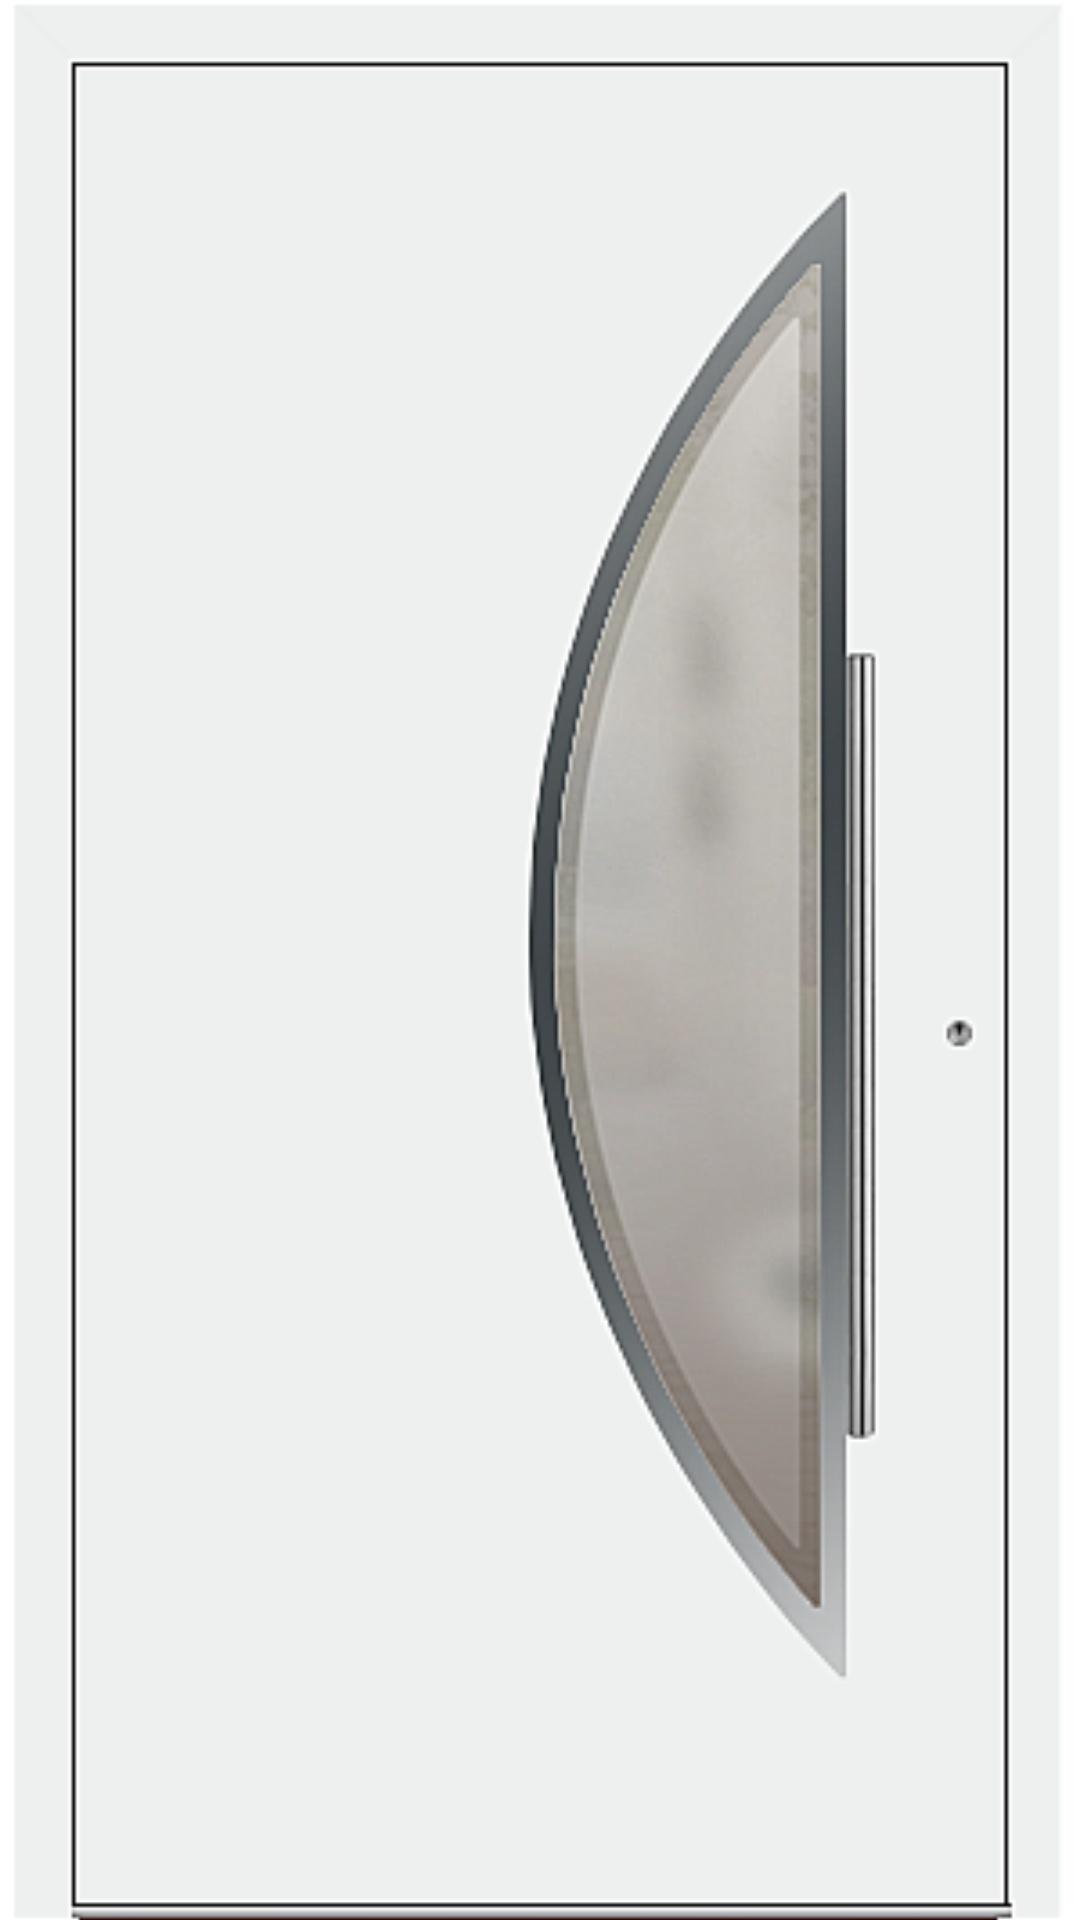 PaXentrée Aluminium Haustür M09171 weiß